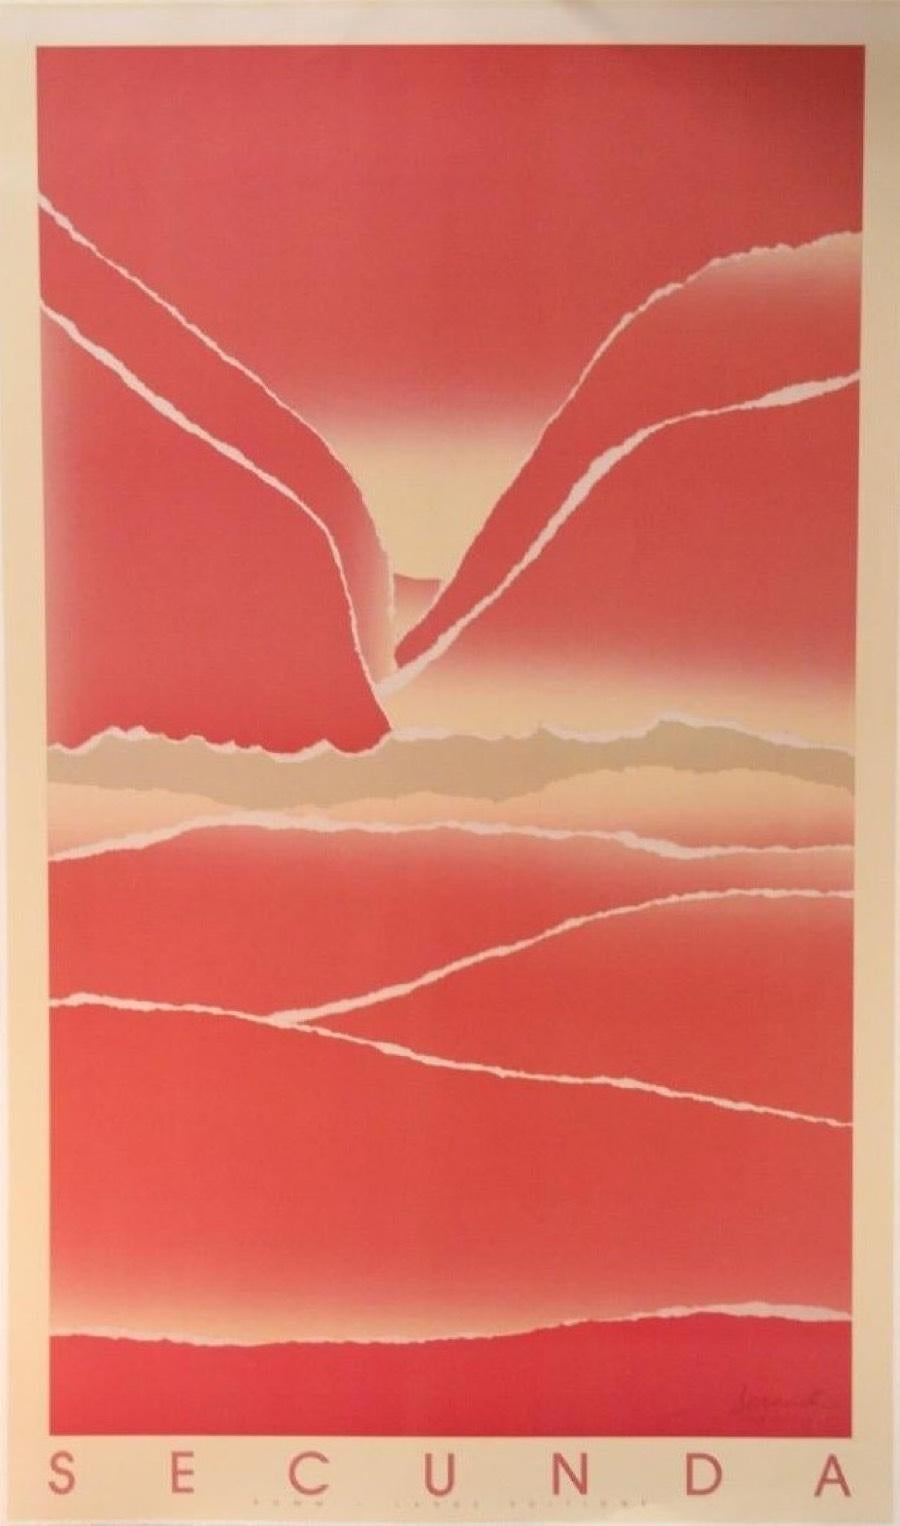 """Oriental Dream"", Arthur Secunda, Beverly Hills, California, March, 1980"